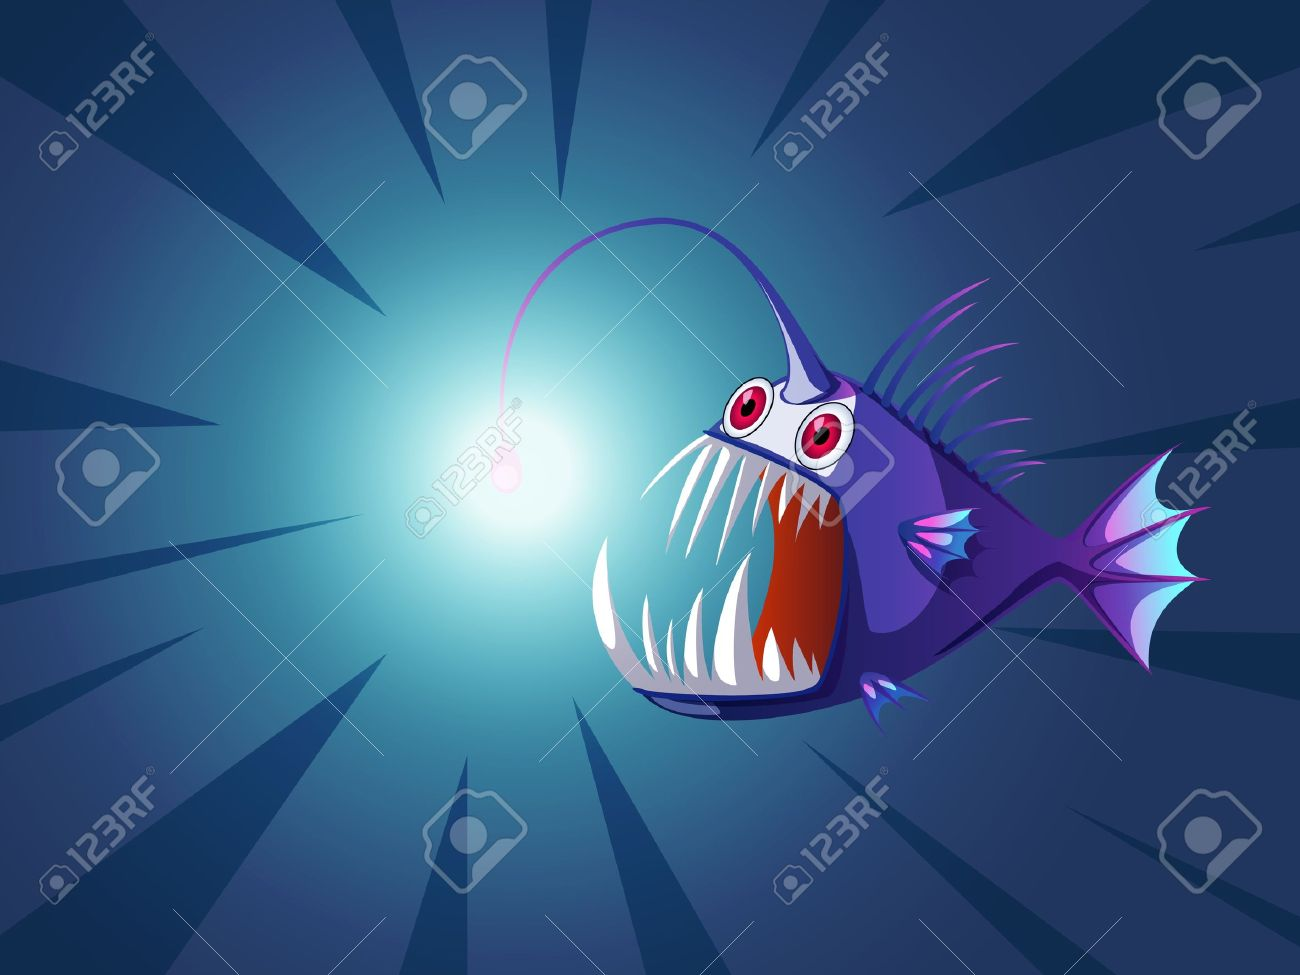 Angler Fish With Light On Head